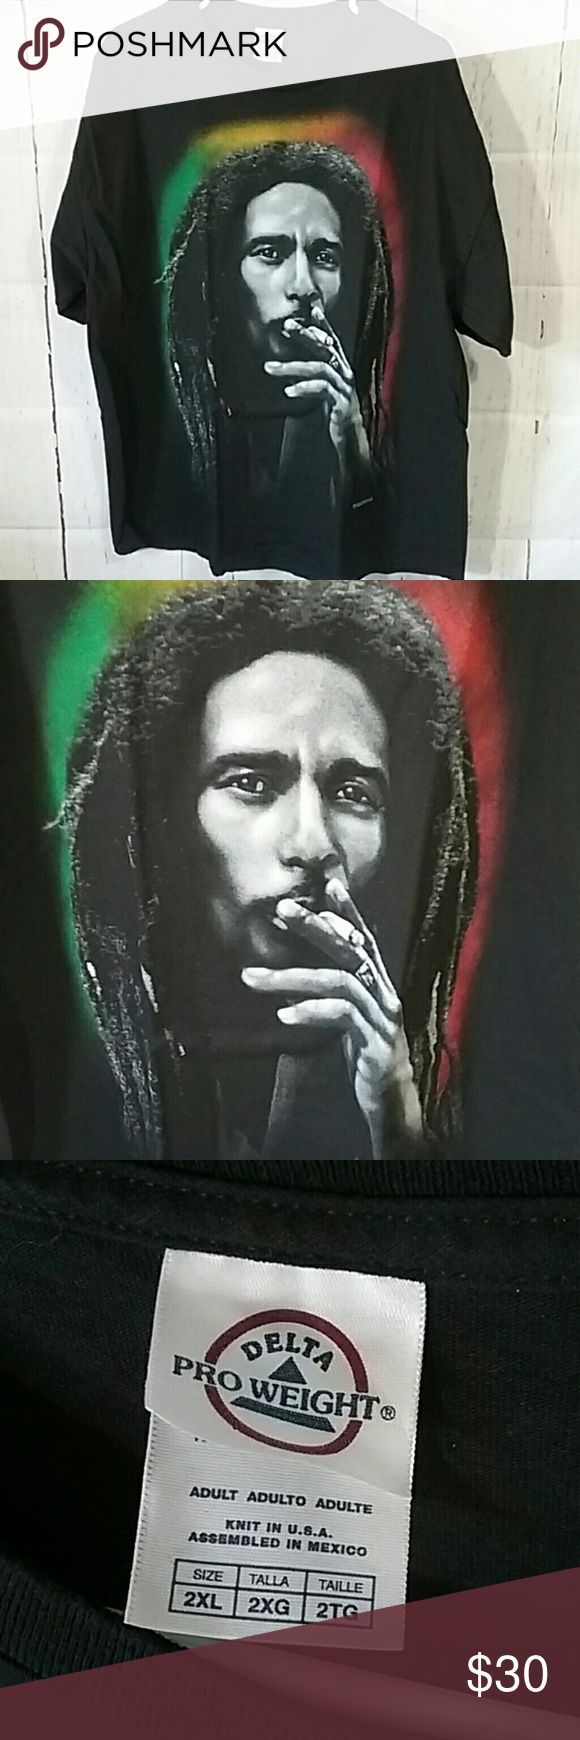 Bob Marley Smokin T-Shirt Bob Marley Smokin T-Shirt Delta Pro Weight Shirts Tees - Short Sleeve